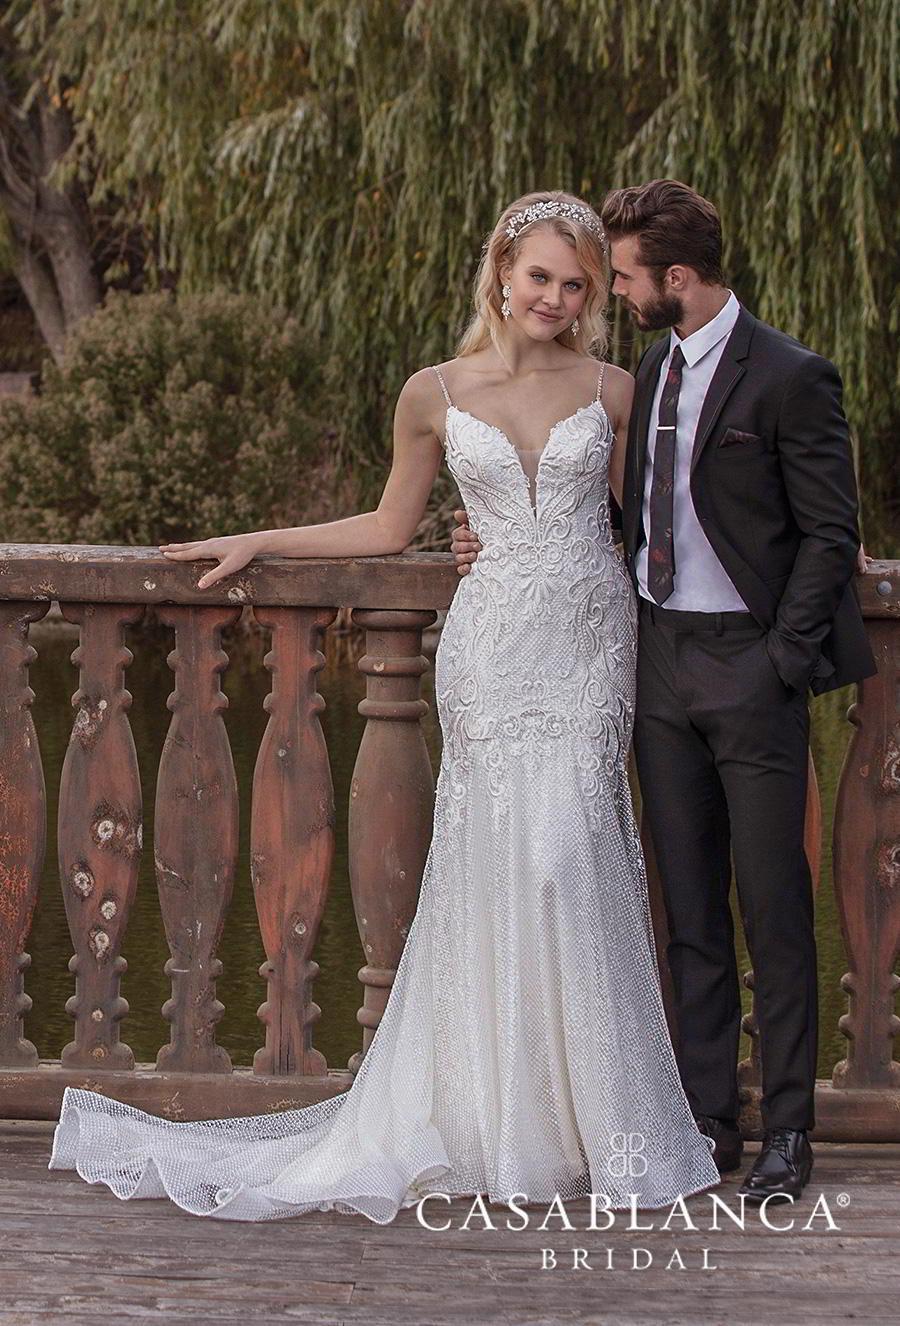 casablanca fall 2019 bridal sleeveless spaghetti strap deep sweetheart neckline heavily embellished bodice glamorous elegant sheath wedding dress (2380) mv